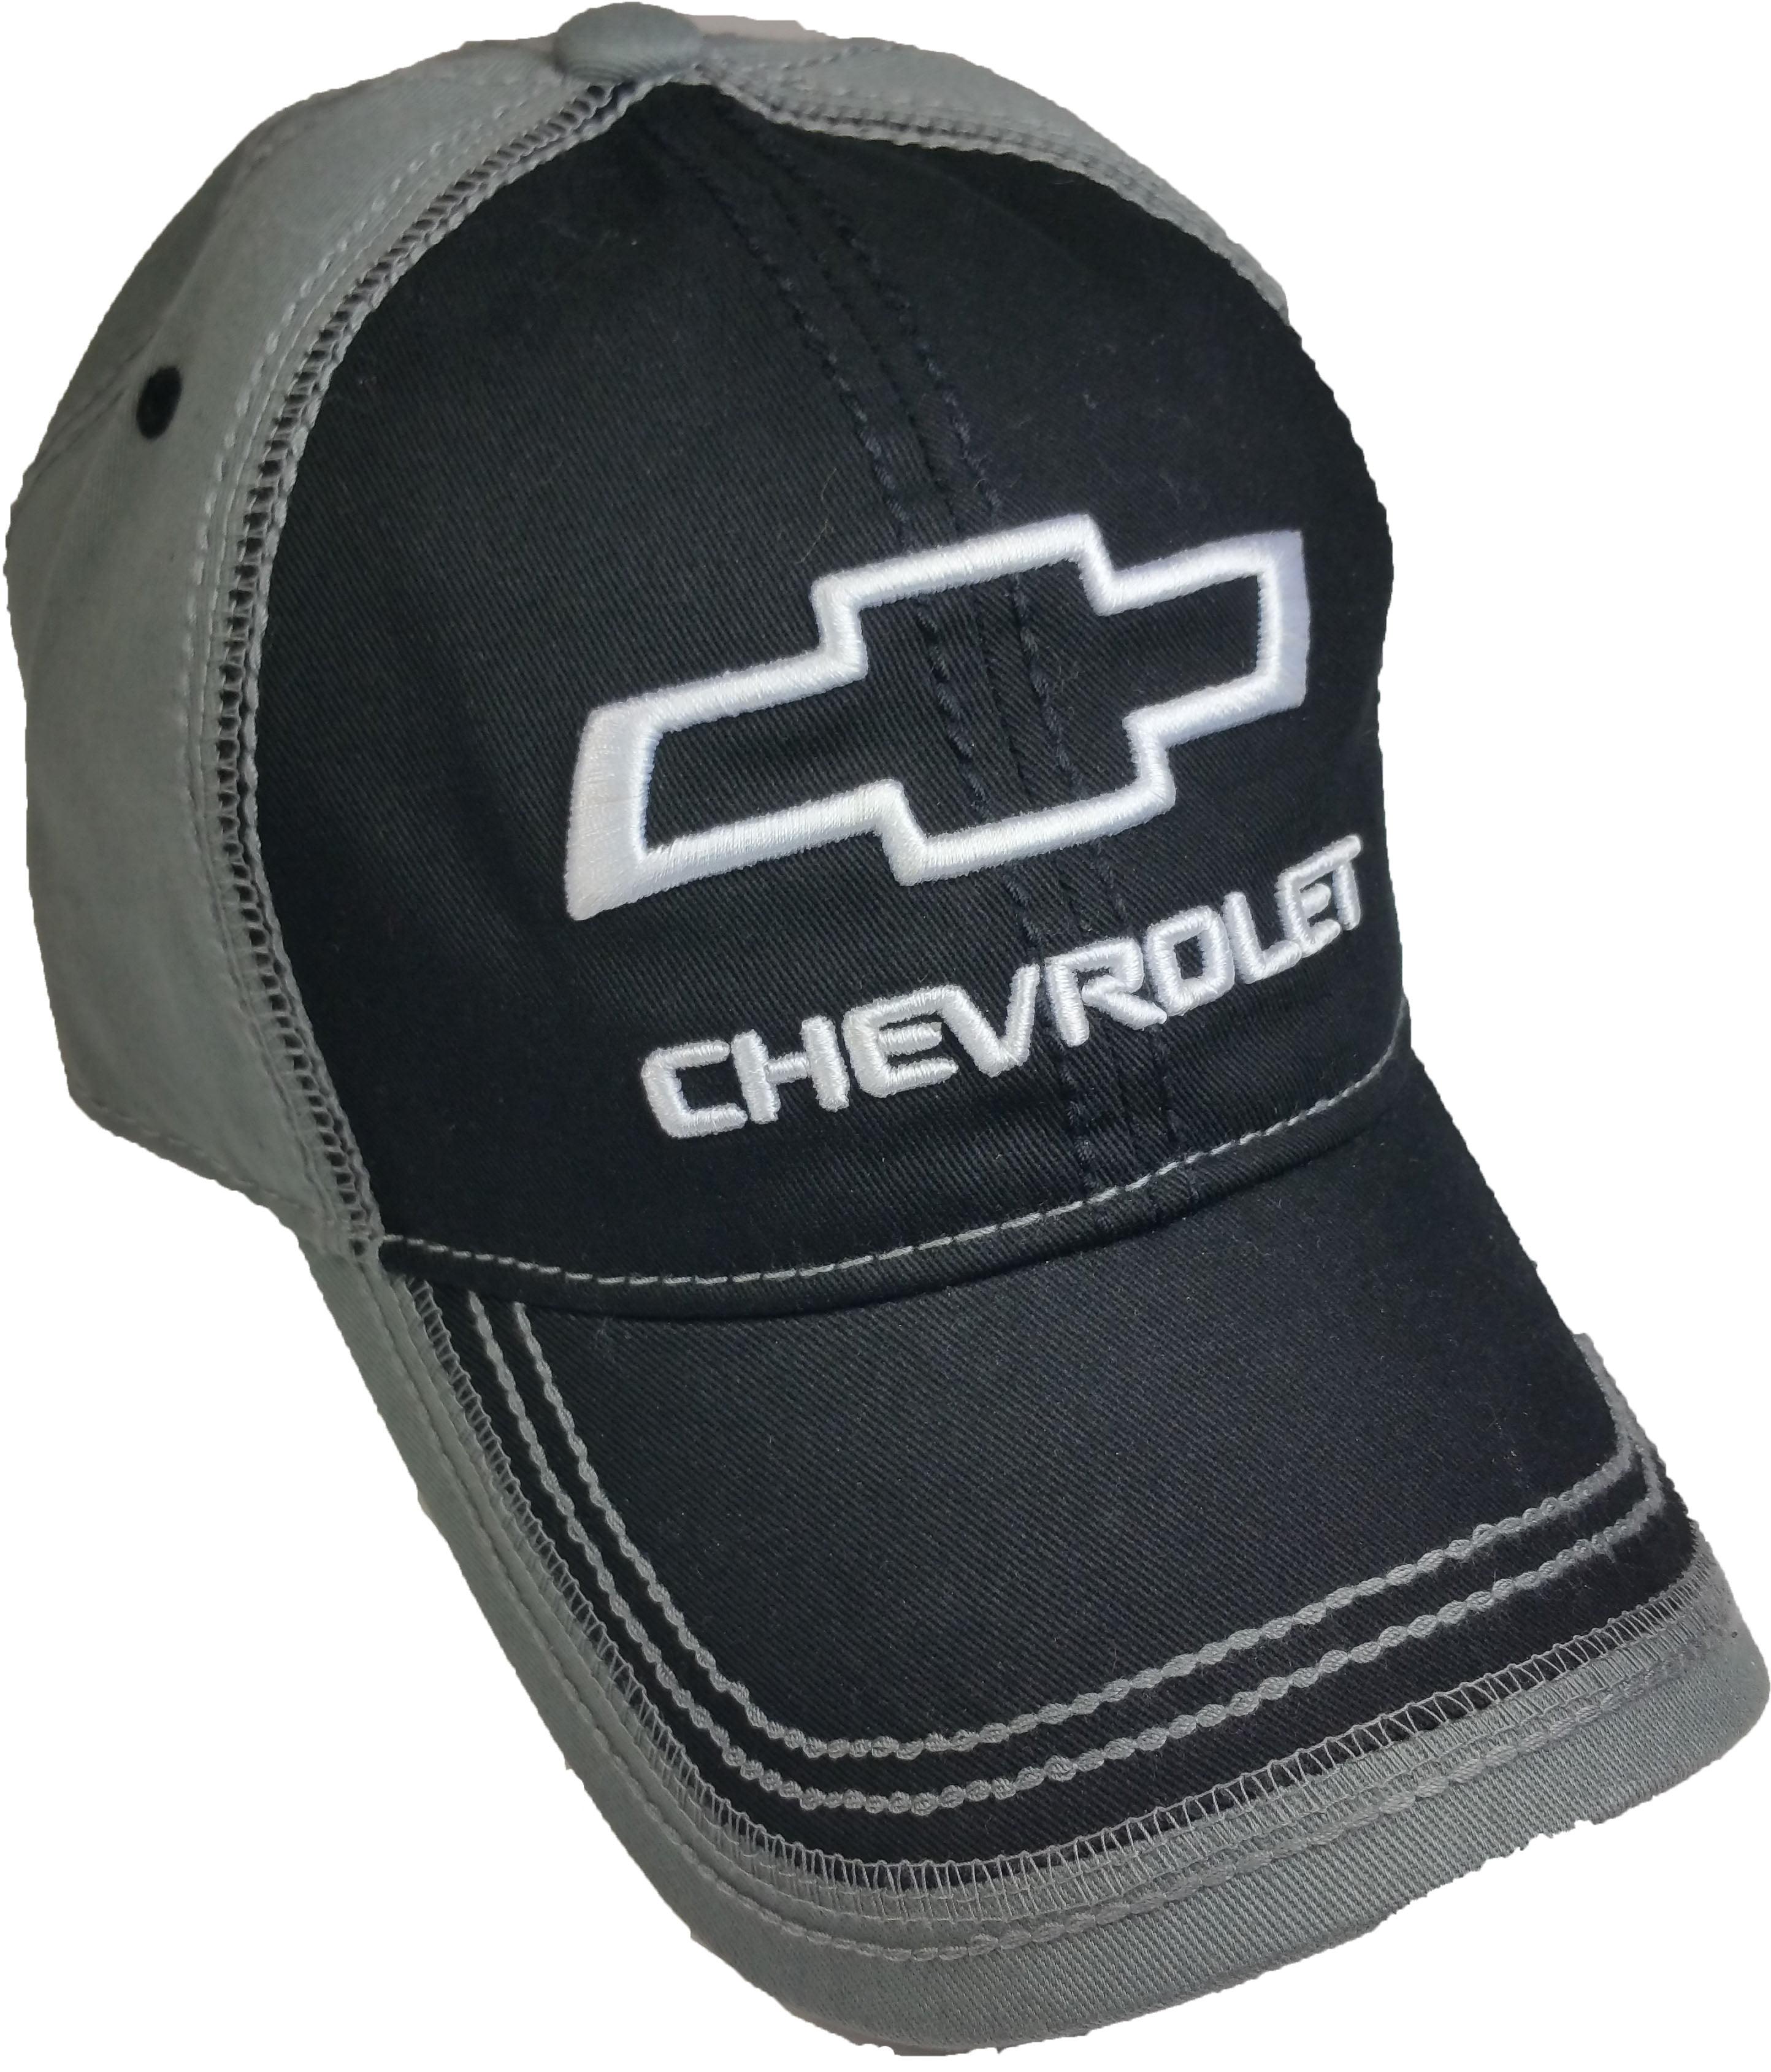 Gm Chevy Chevrolet Bowtie Logo muscle car Basecap Casquette Trucker Baseball Cap NEUF